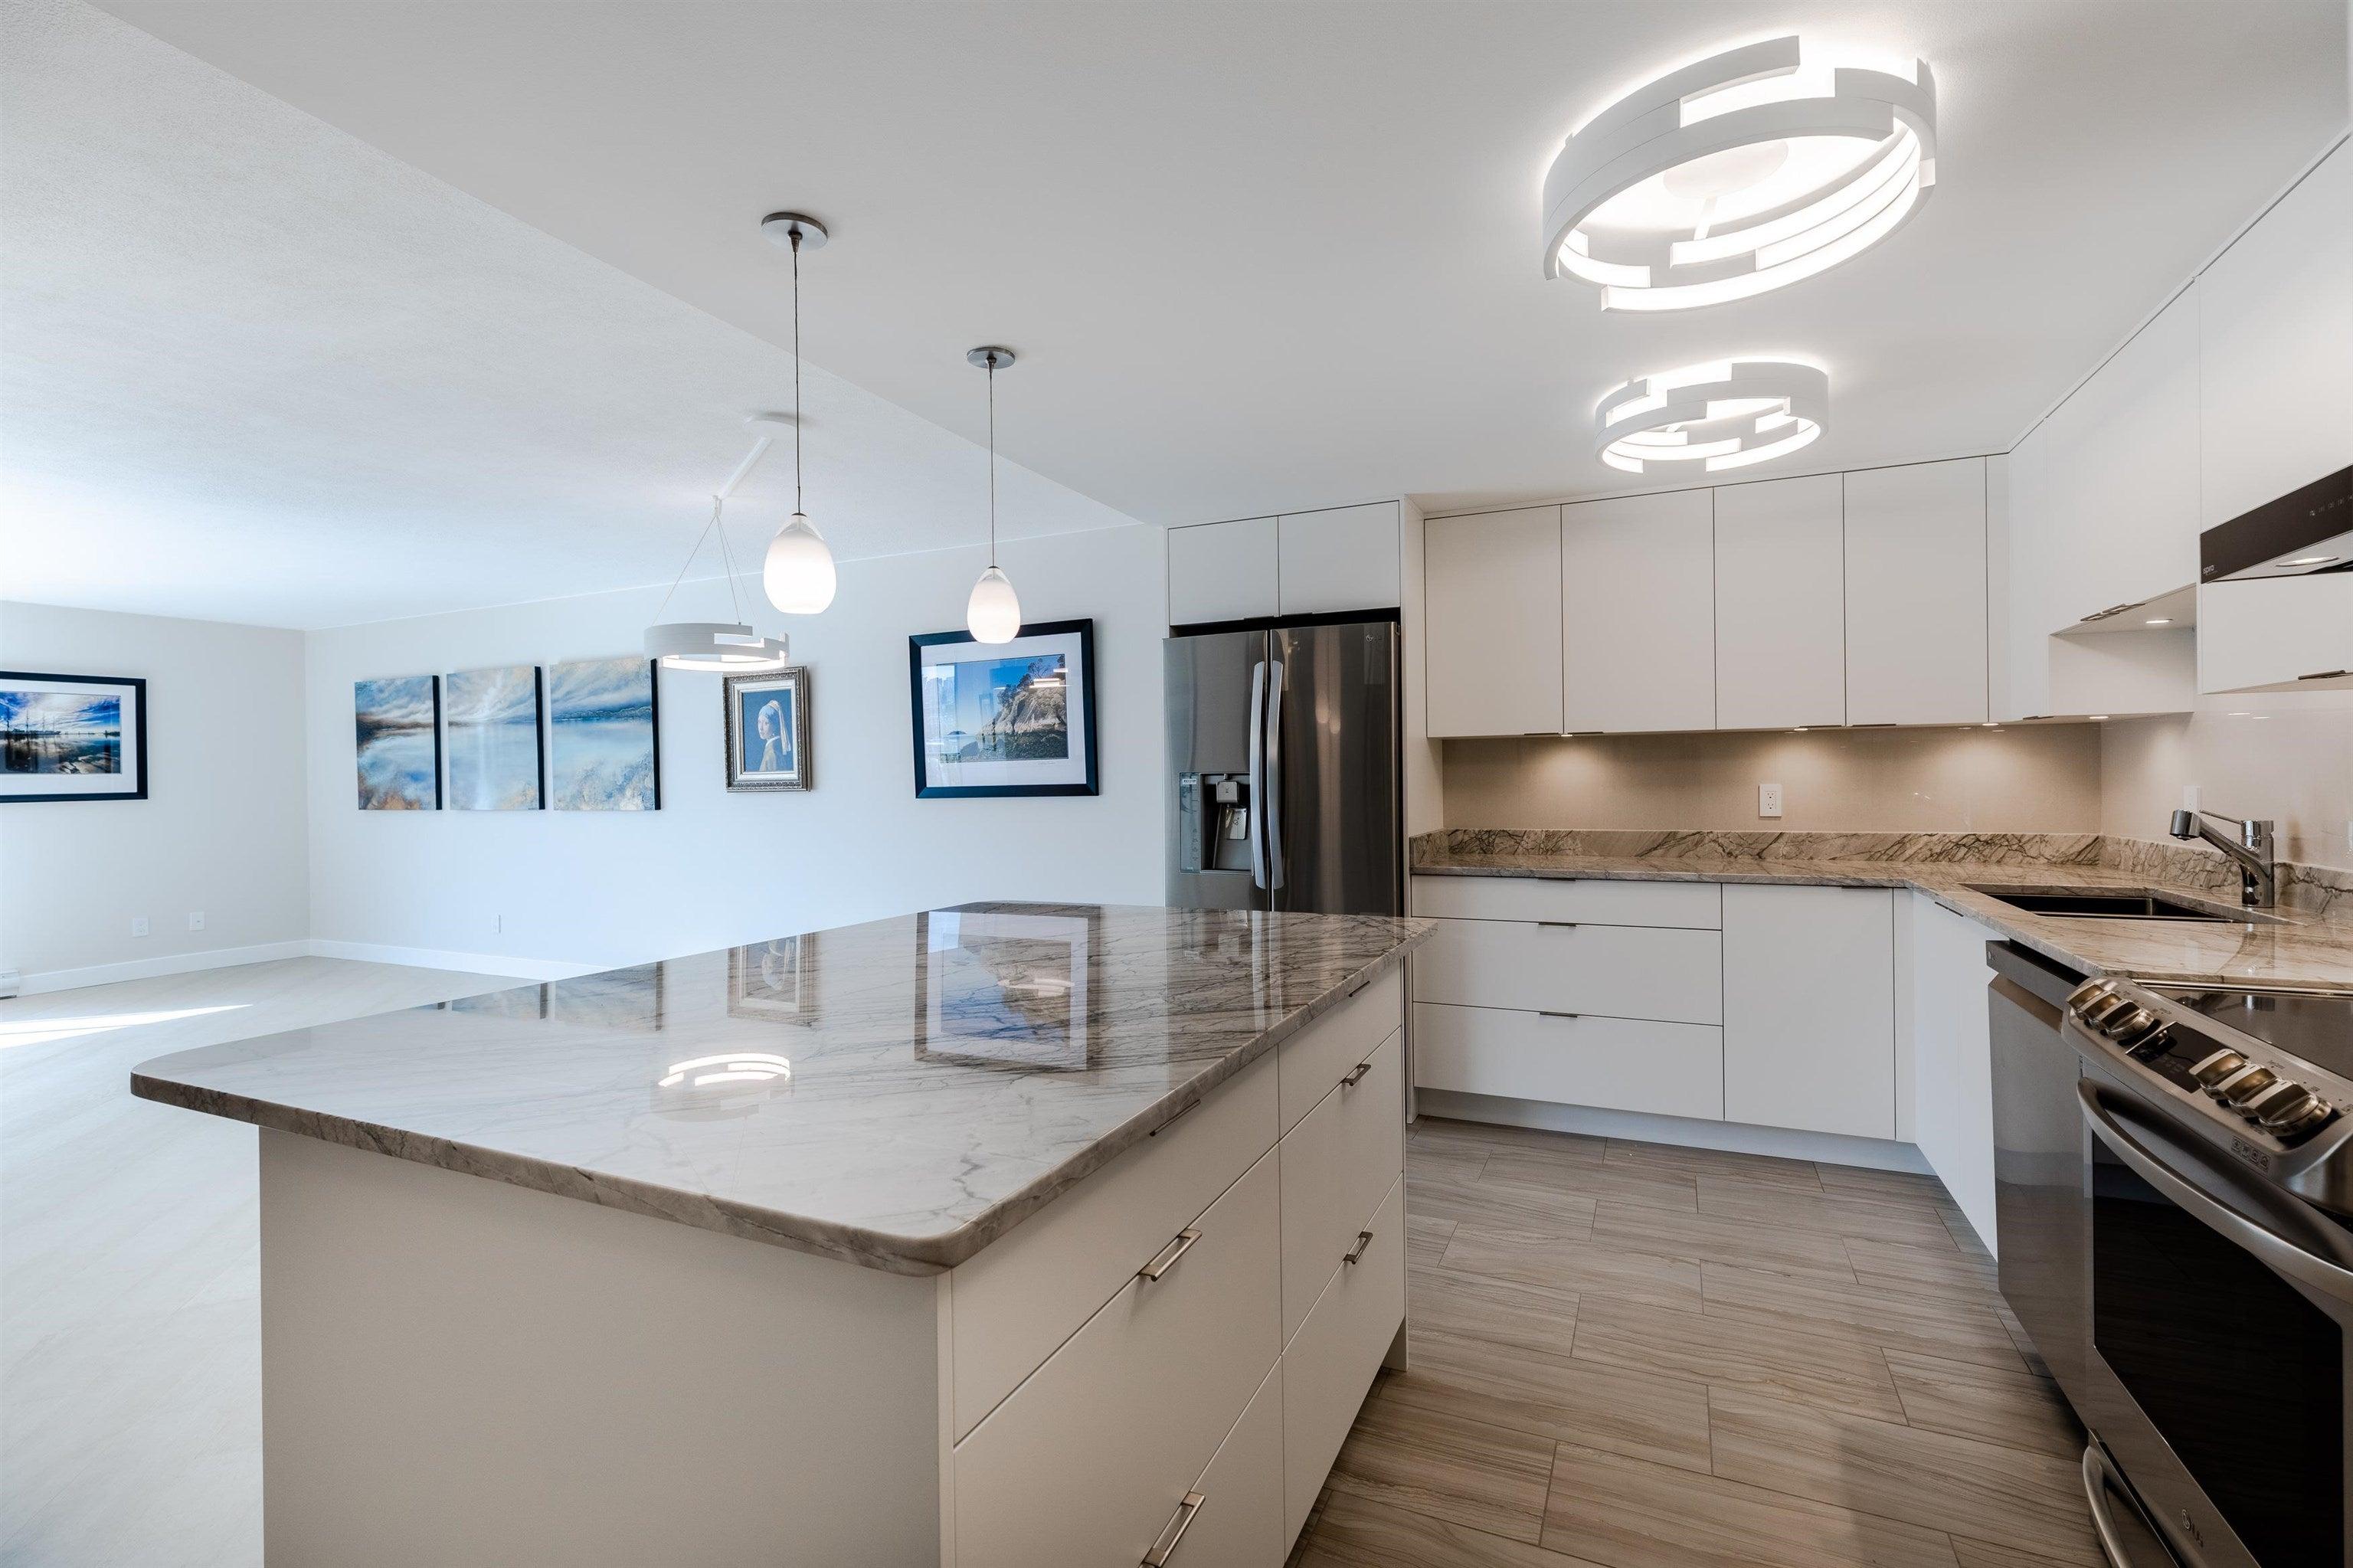 406 1450 PENNYFARTHING DRIVE - False Creek Apartment/Condo for sale, 2 Bedrooms (R2617259) - #9